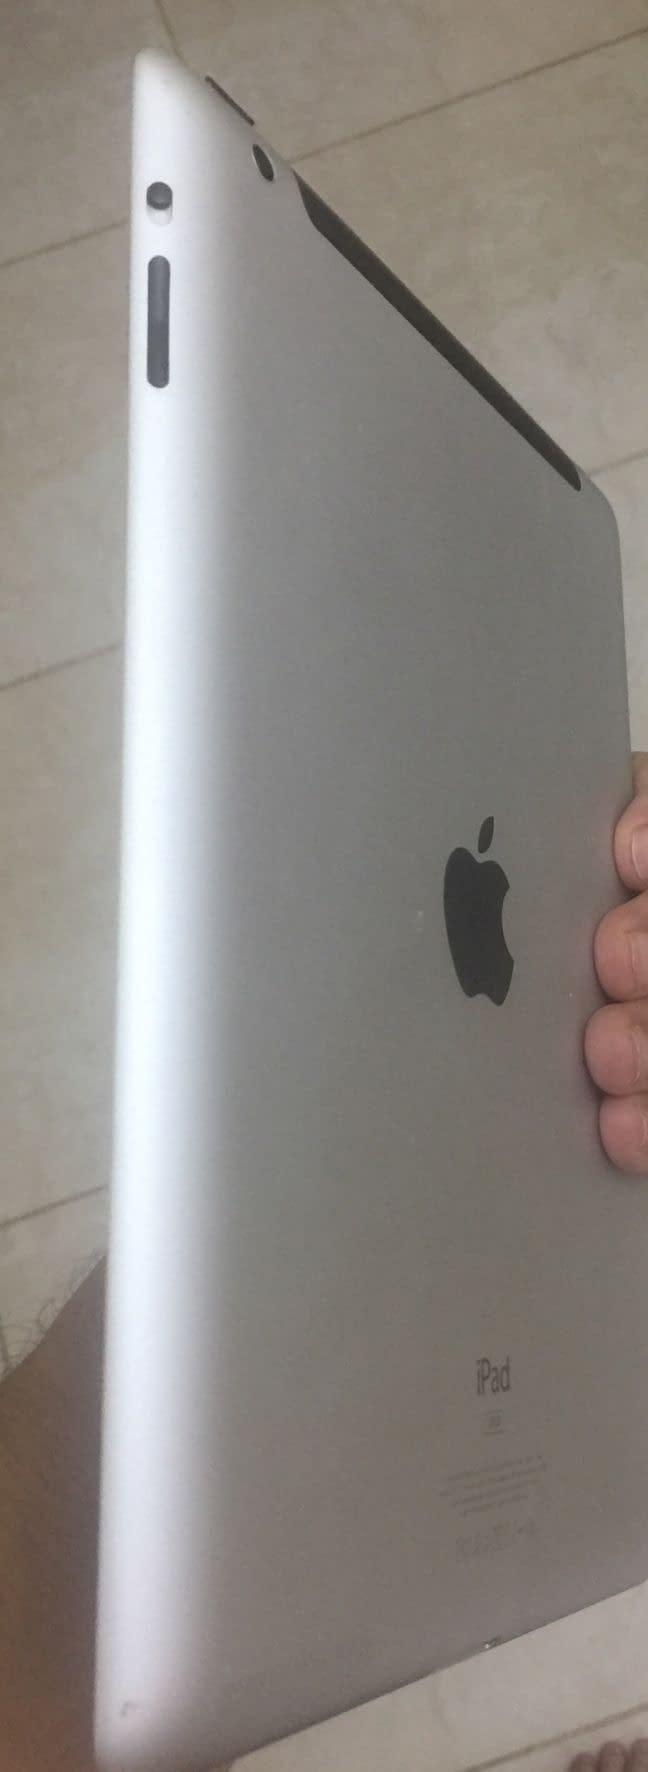 Ipad3 wifi 4G 32 GB in good condition